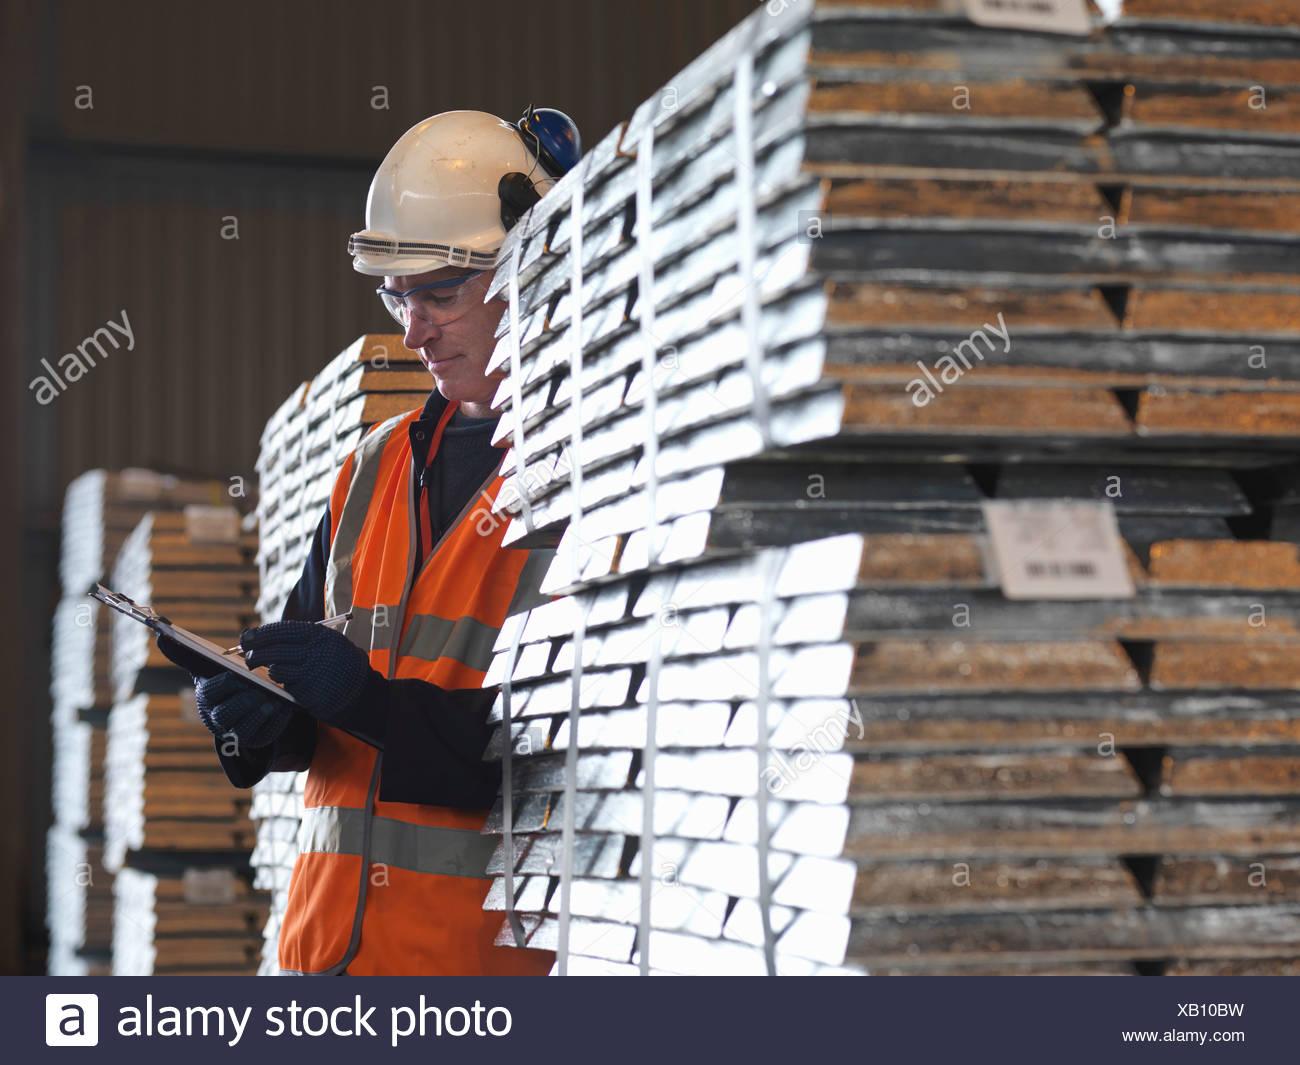 Port Worker Inspecting Cargo - Stock Image